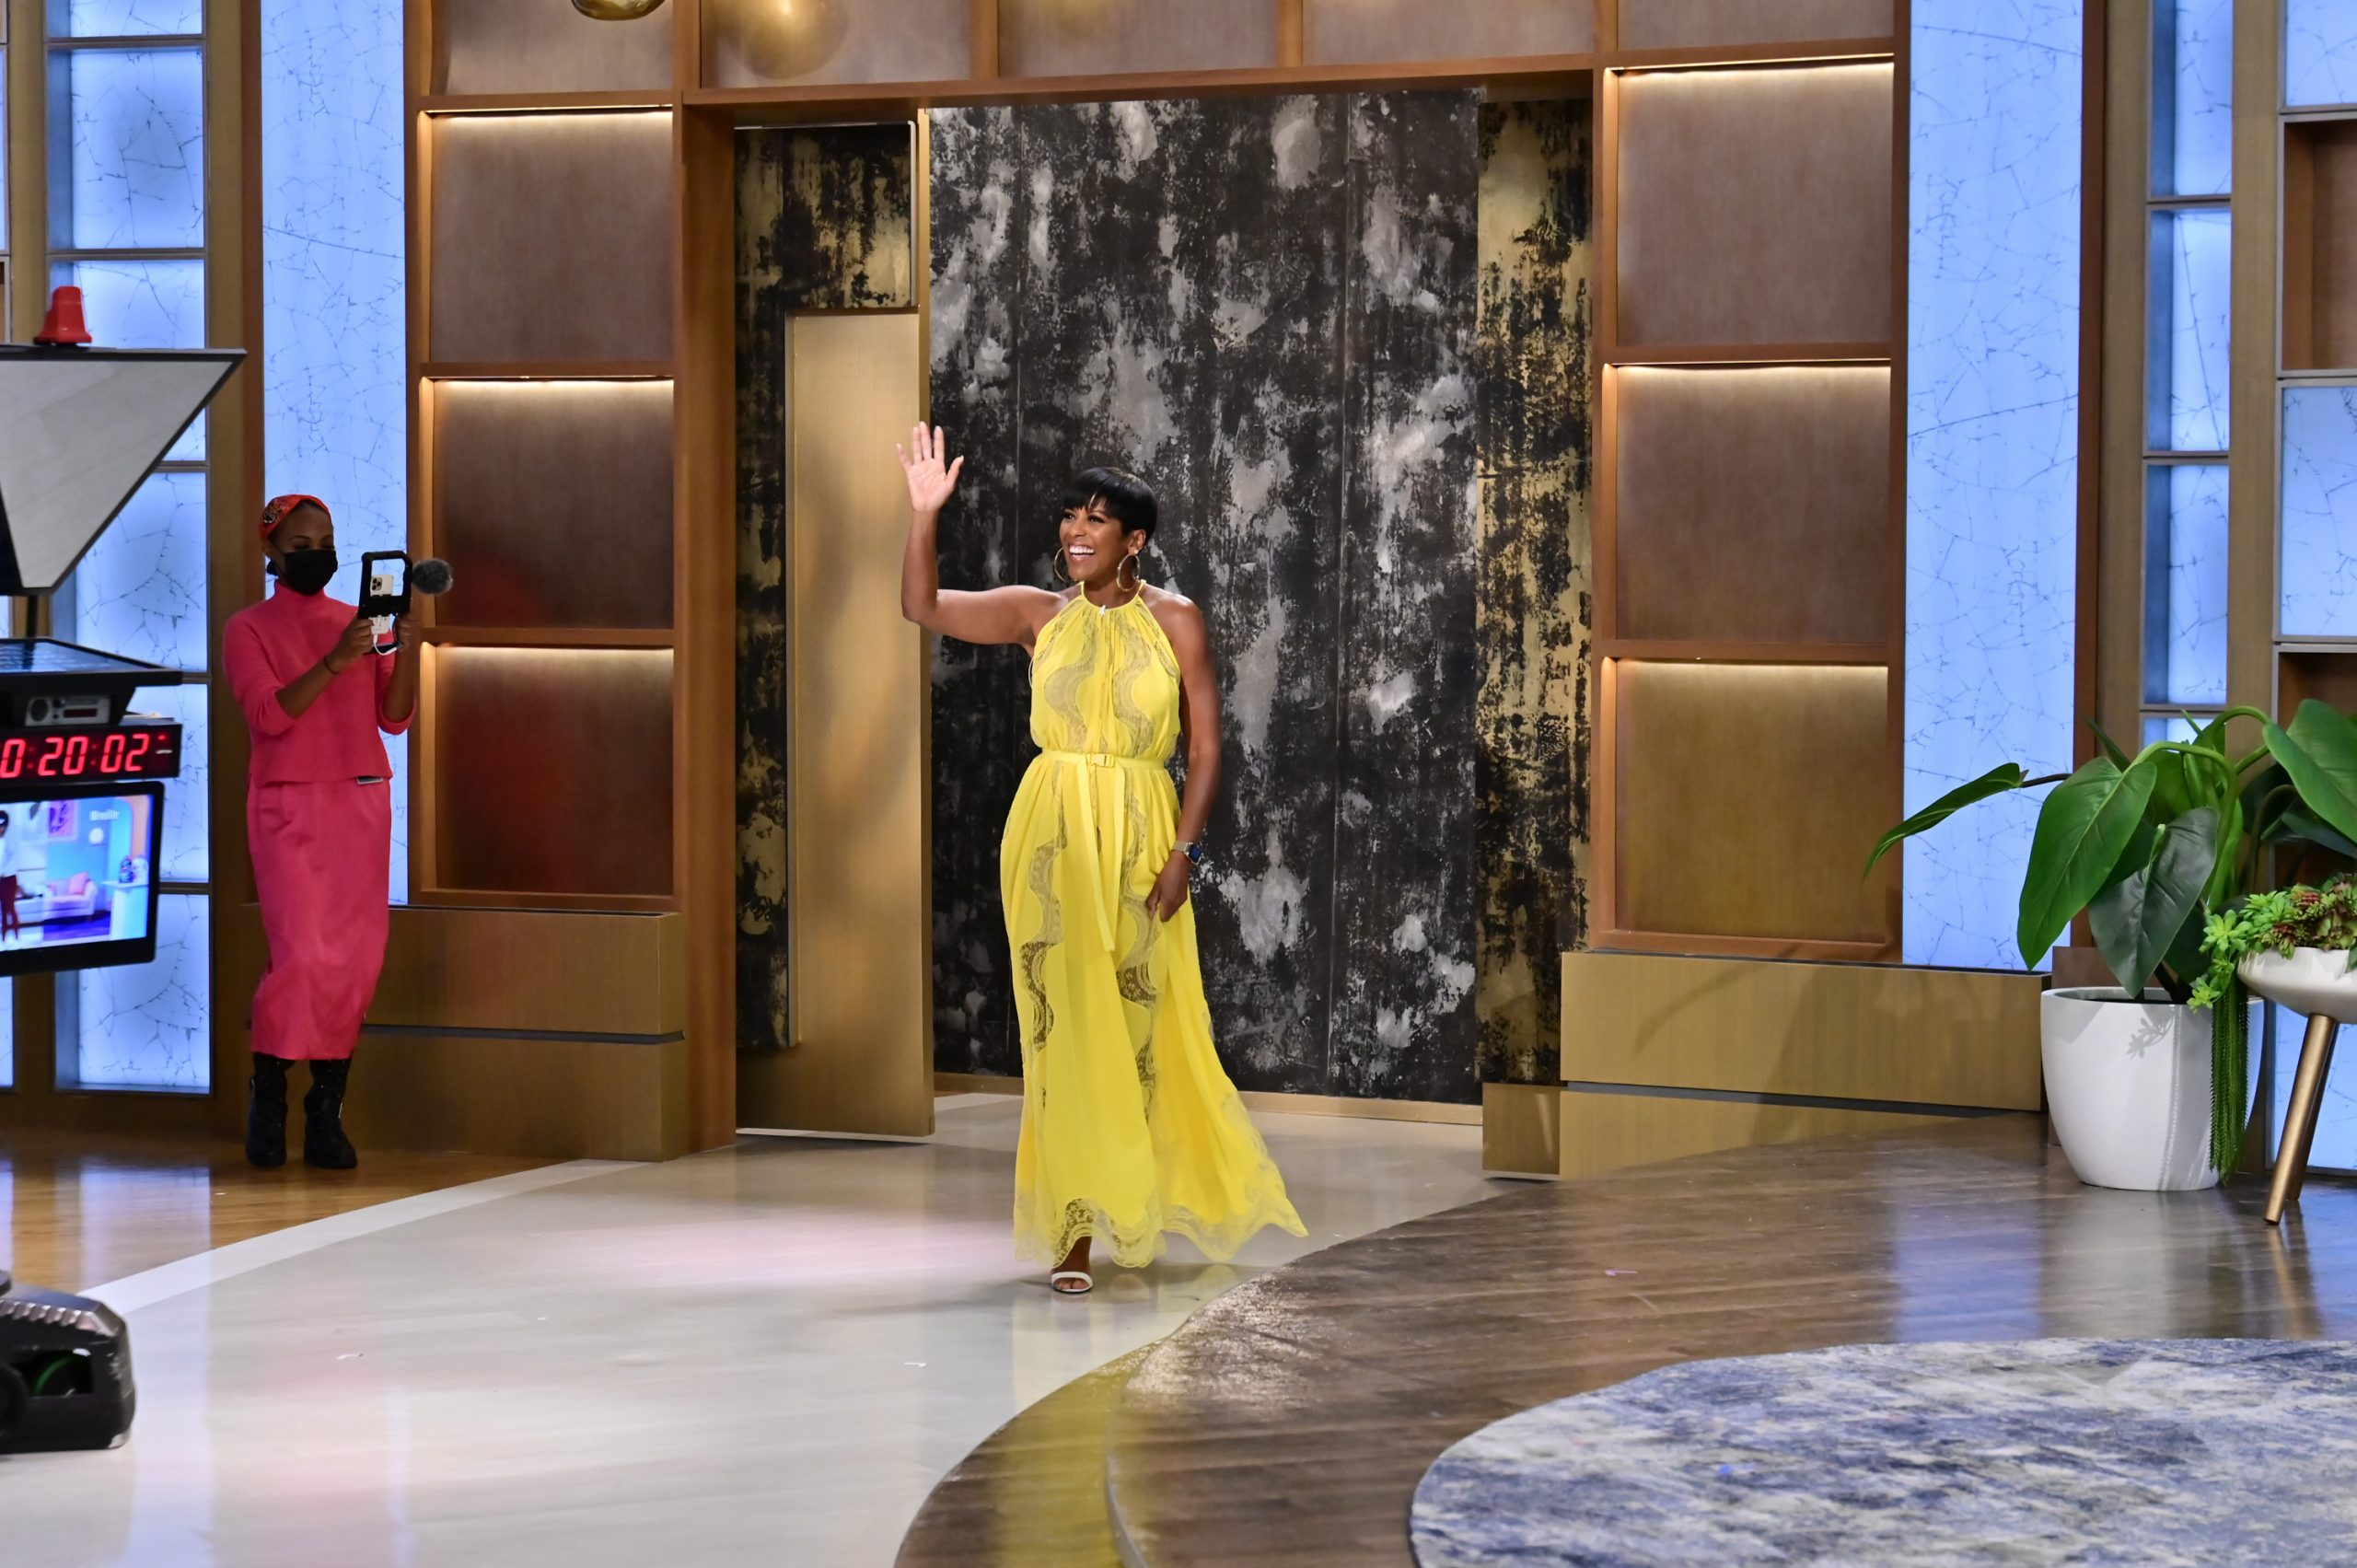 Tamron Hall Celebrates Turning 51 On Her Show